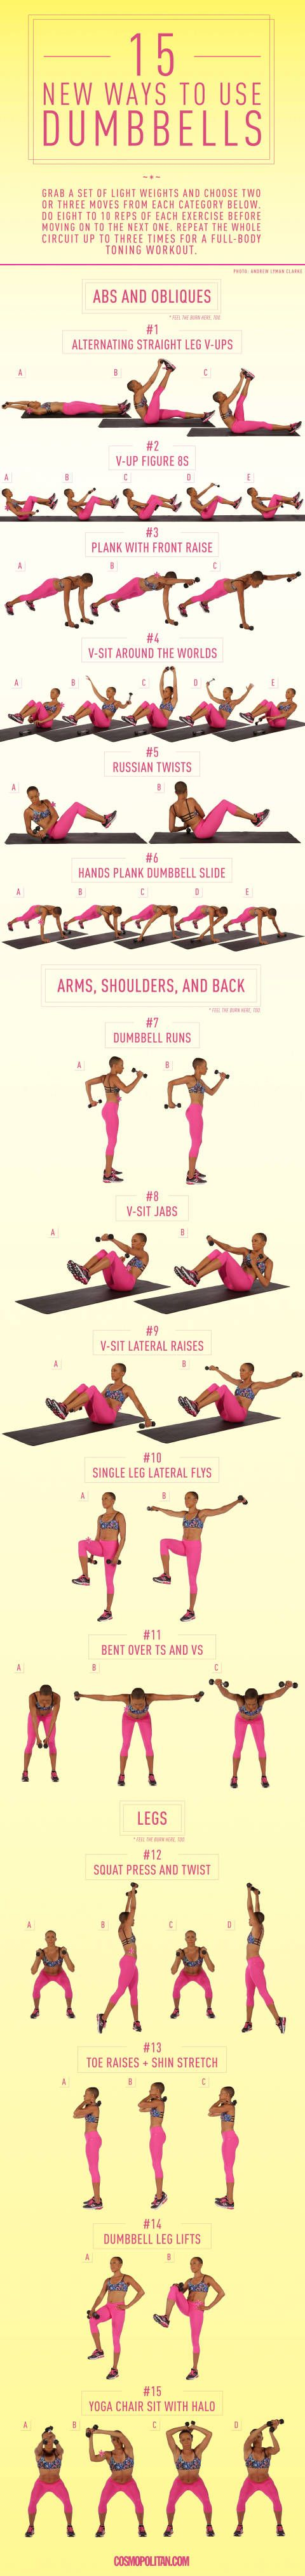 Dumbbell Exercises - 15 New Ways to Use Dumbbells